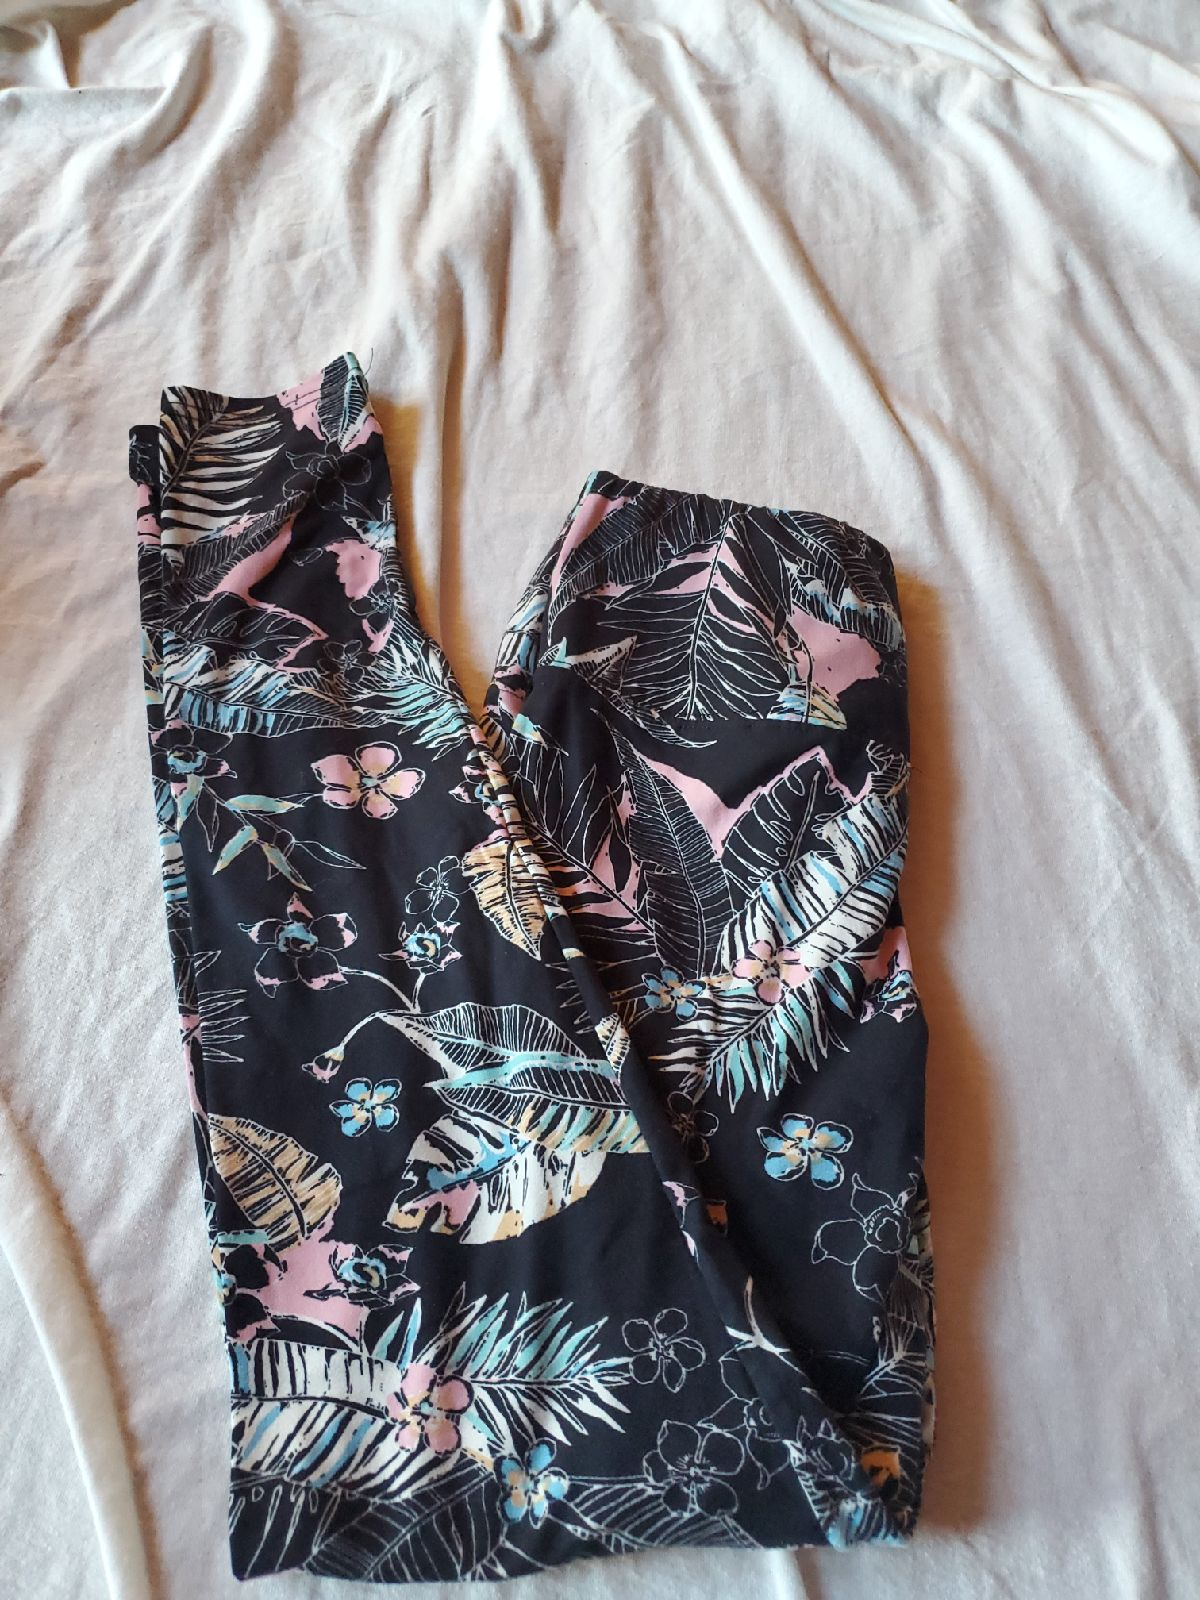 Yado leggings